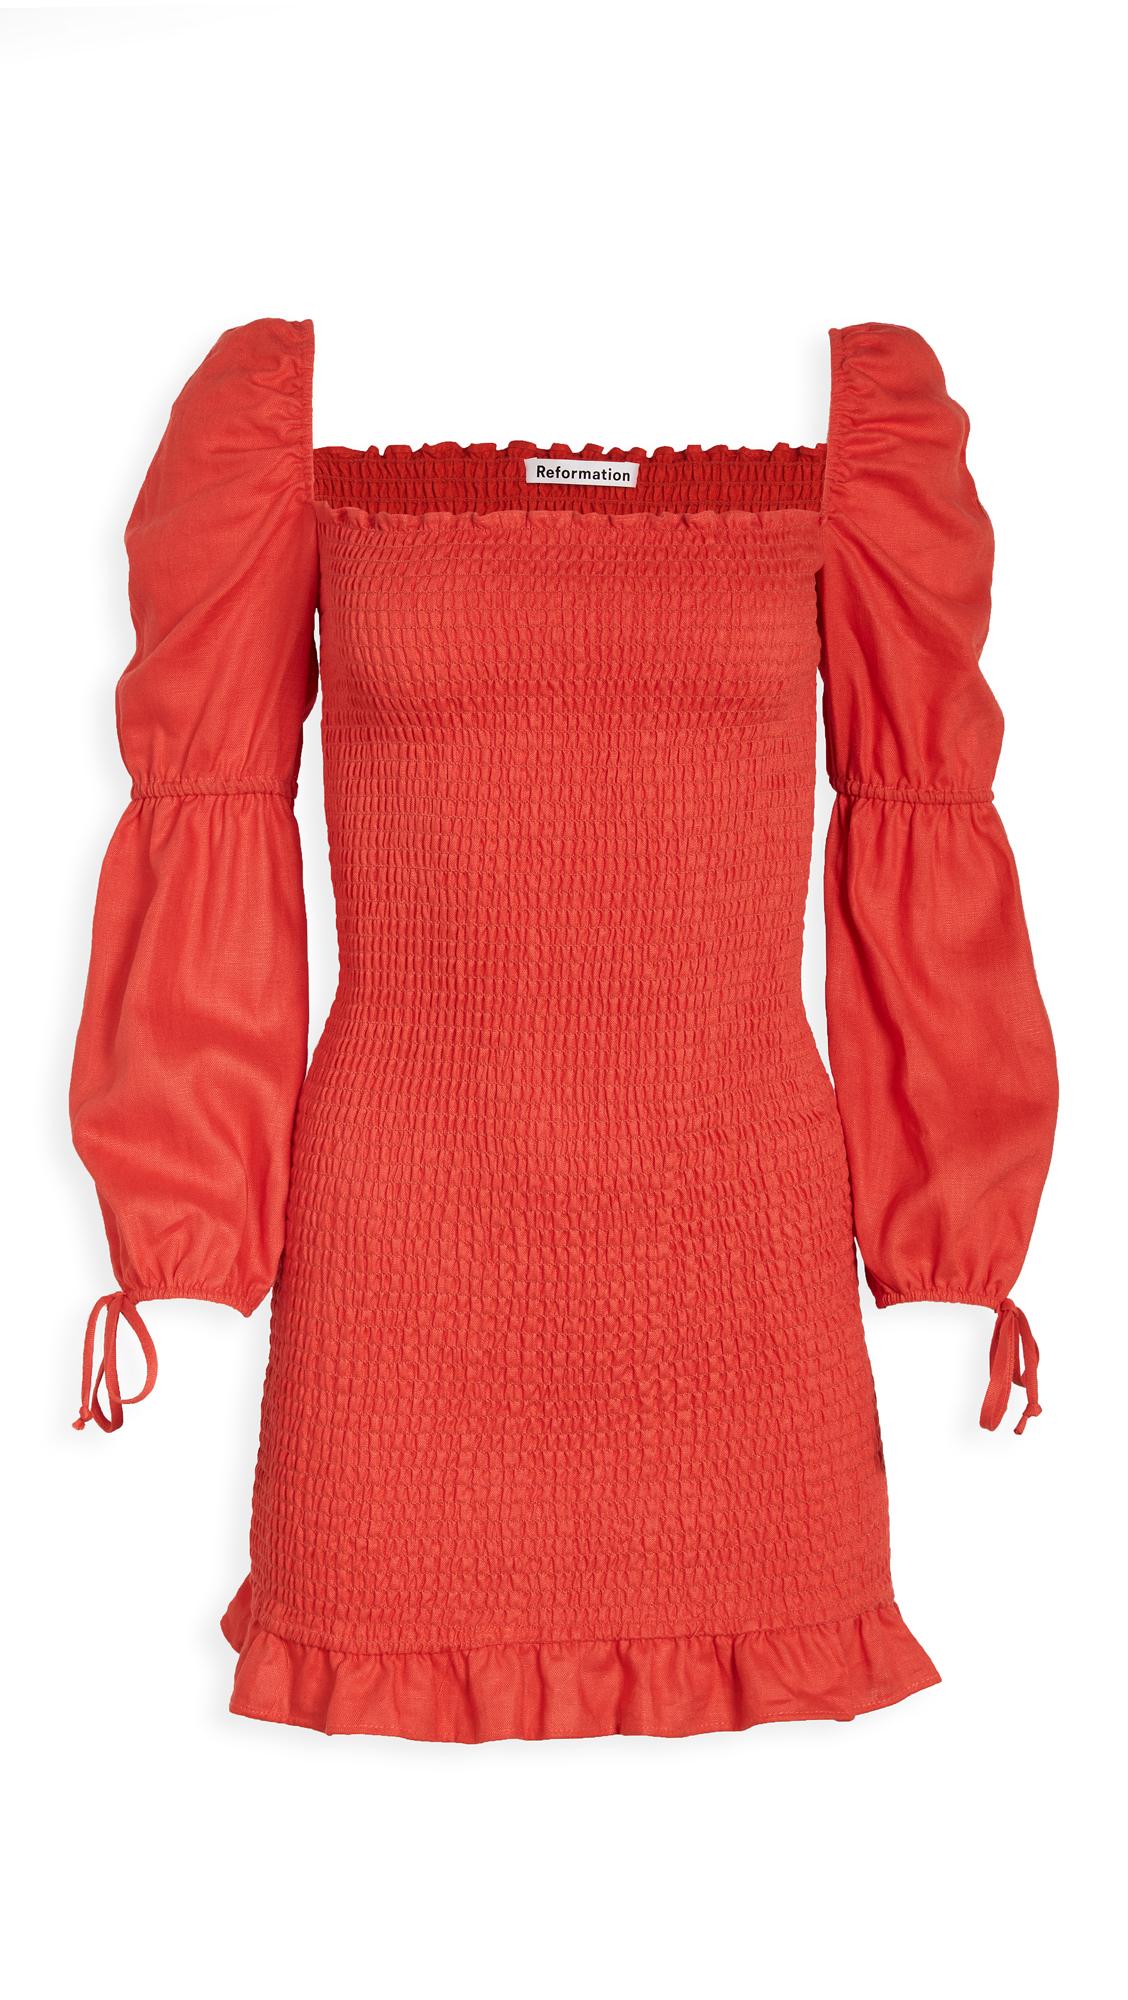 Reformation Hilary Dress